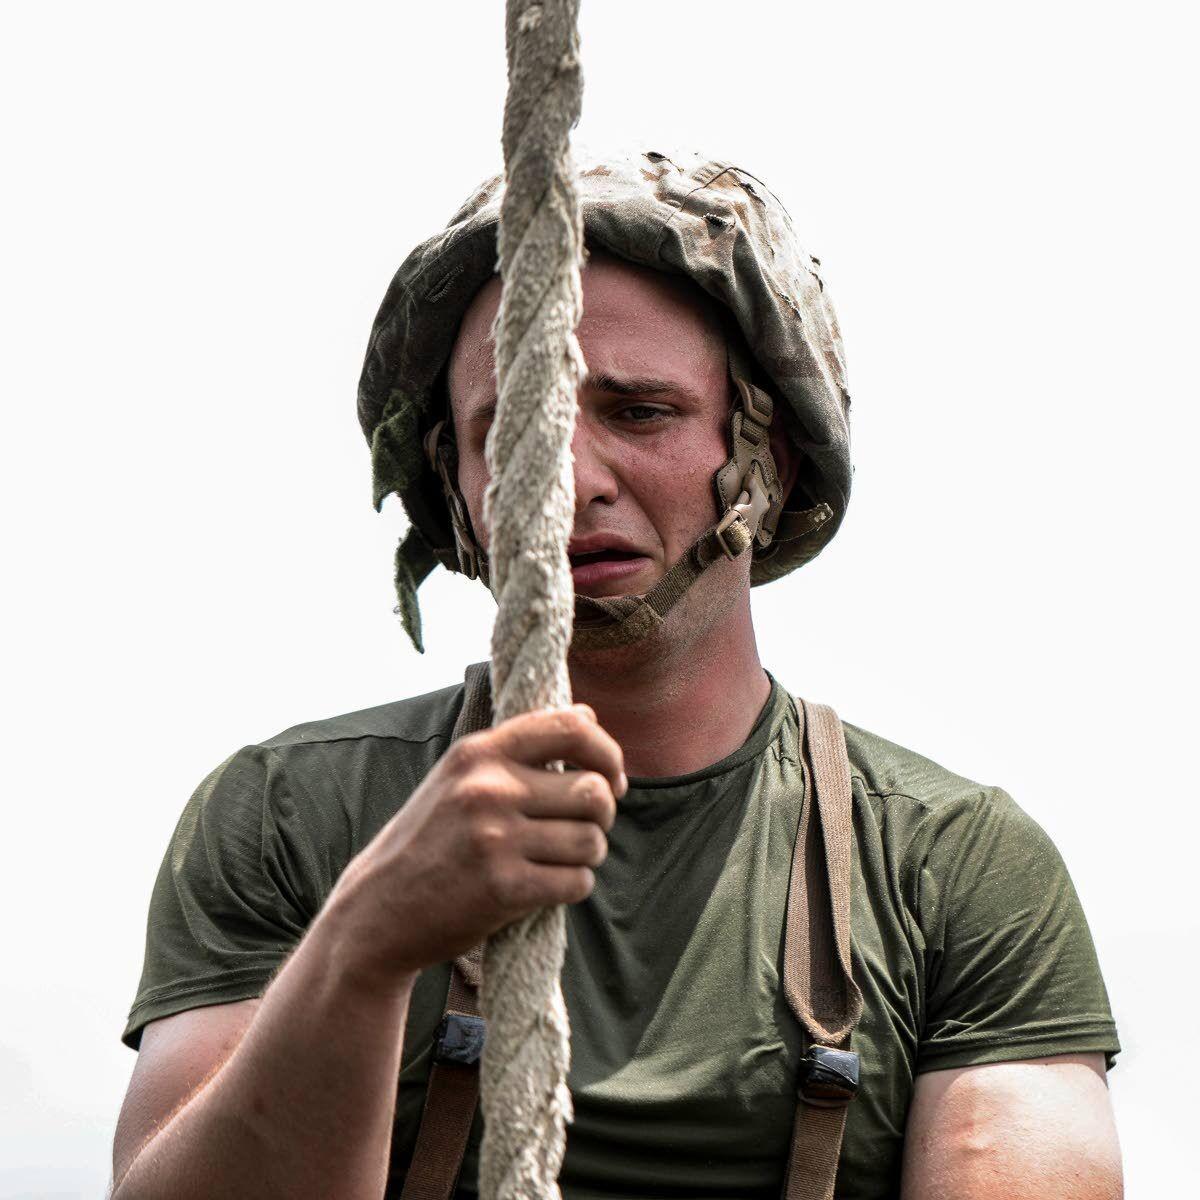 Camera-carrying Marine